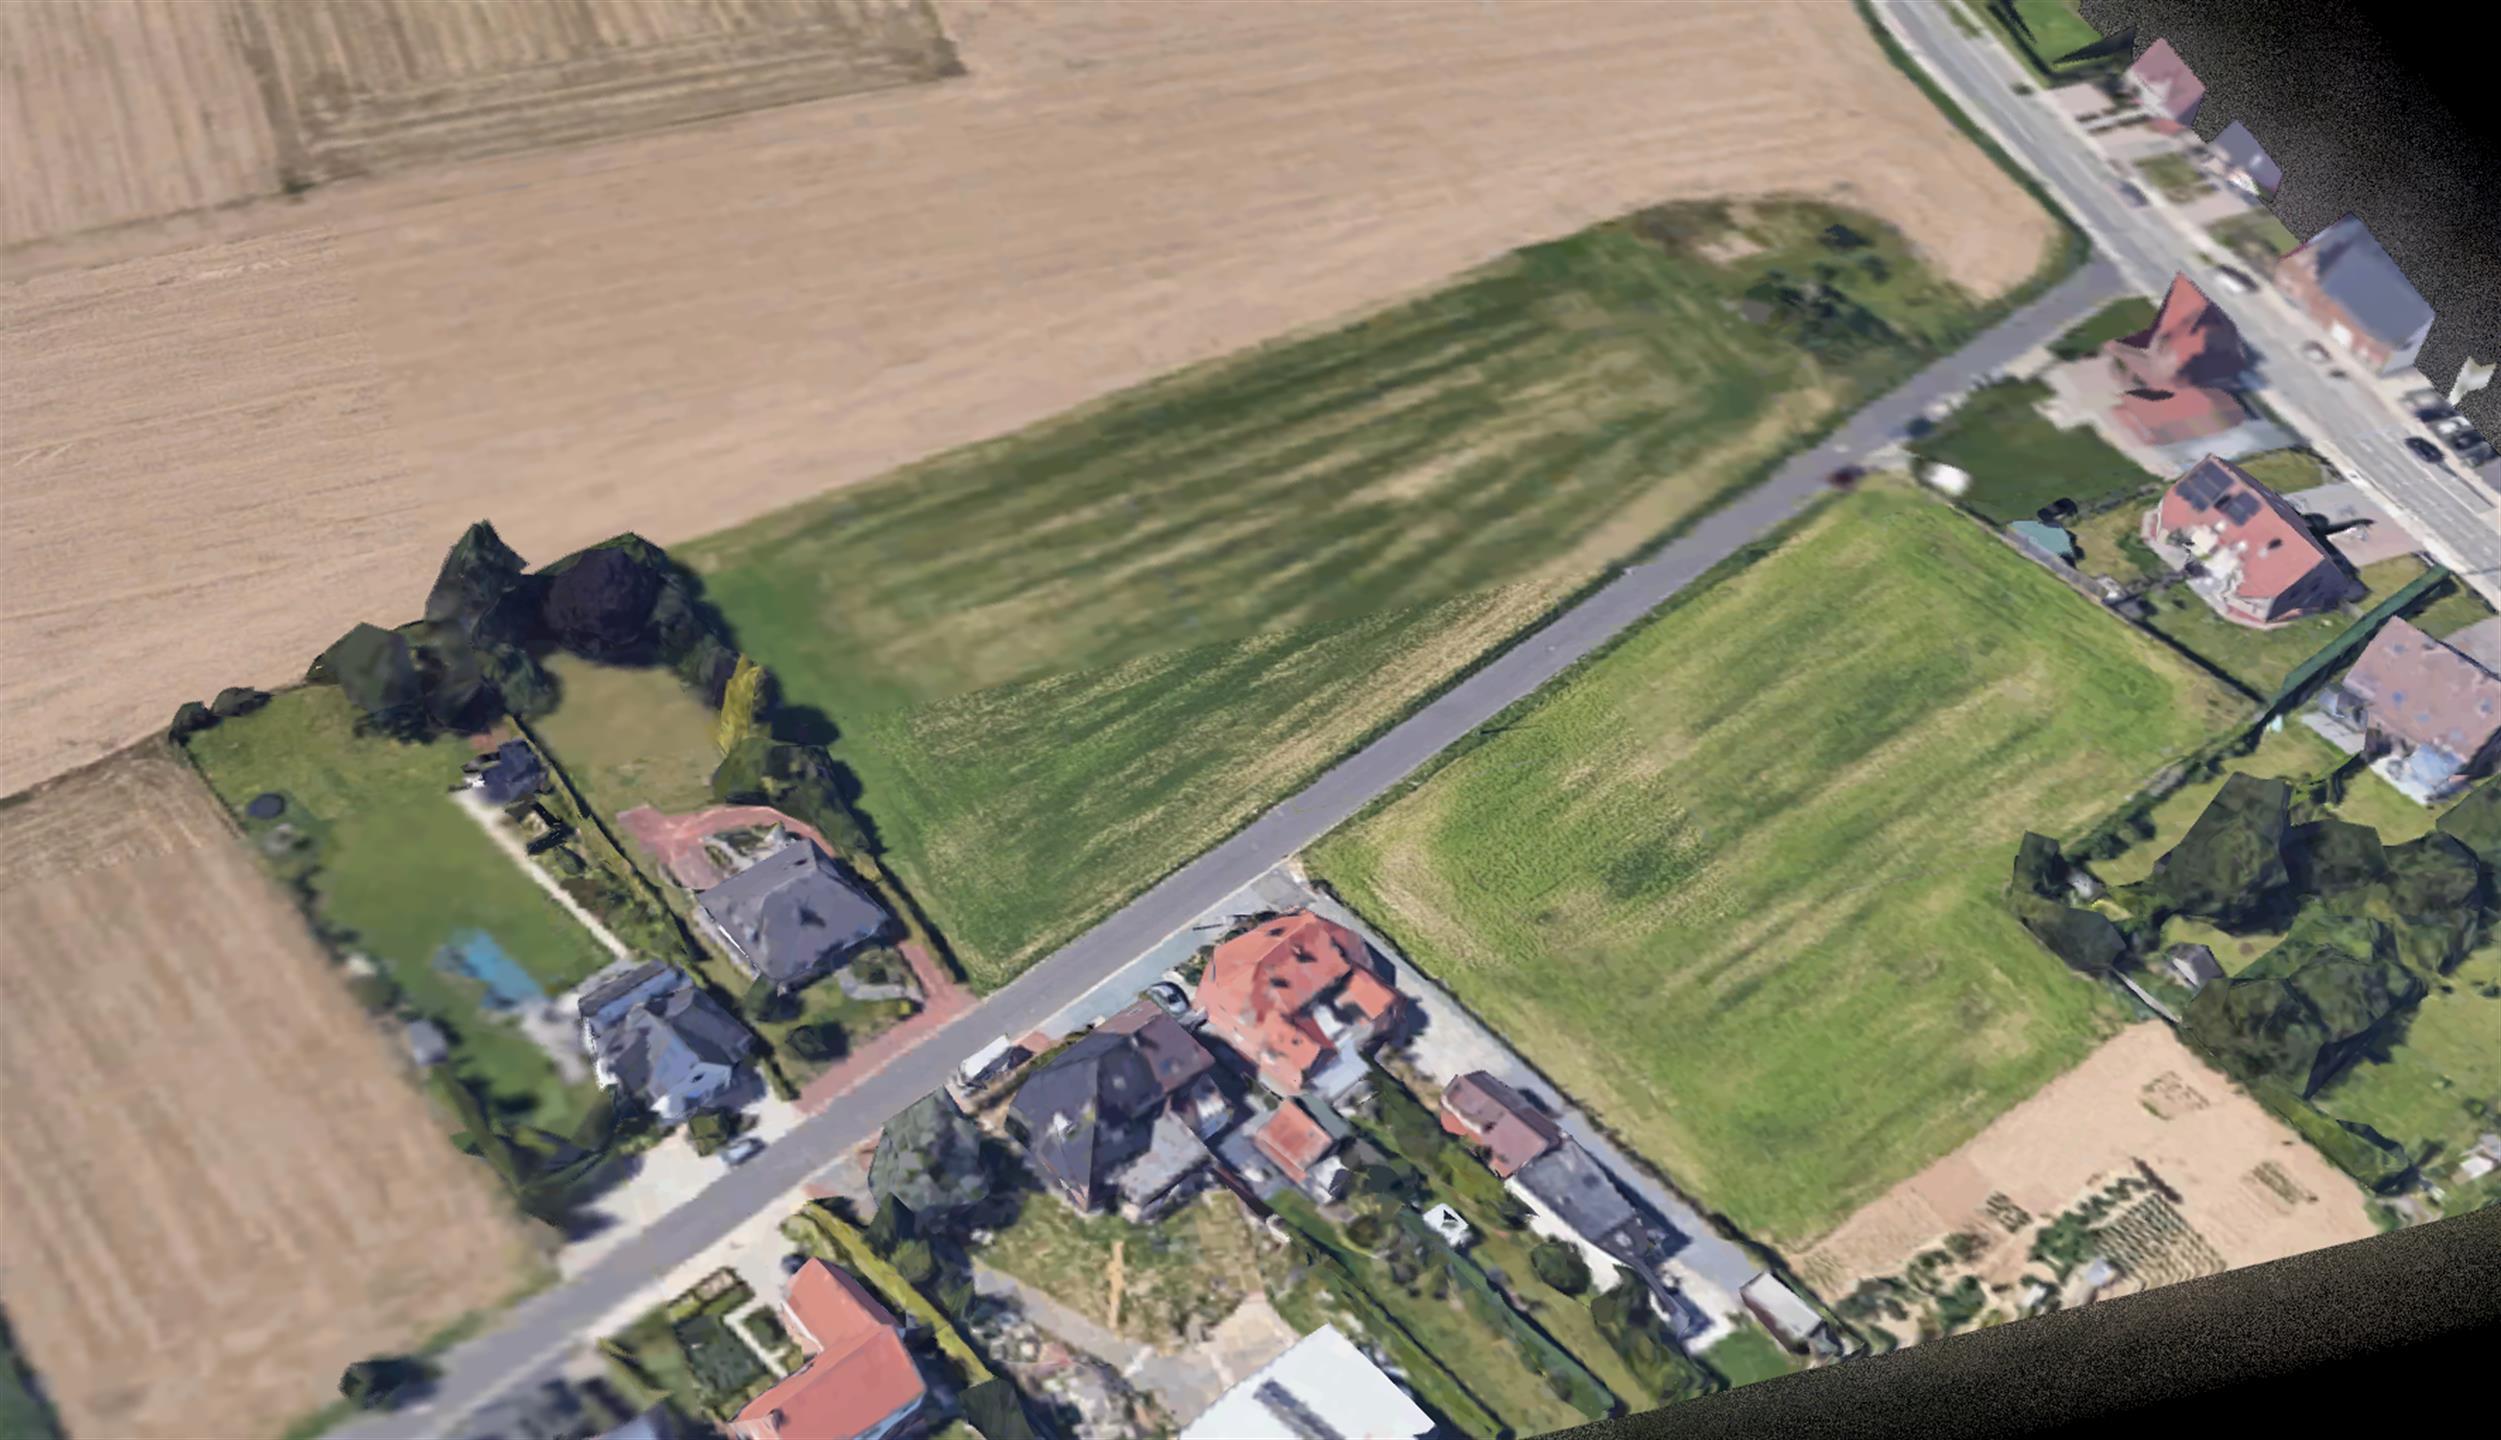 Terrain à bâtir - Sint-Pieters-Leeuw - #4238883-0